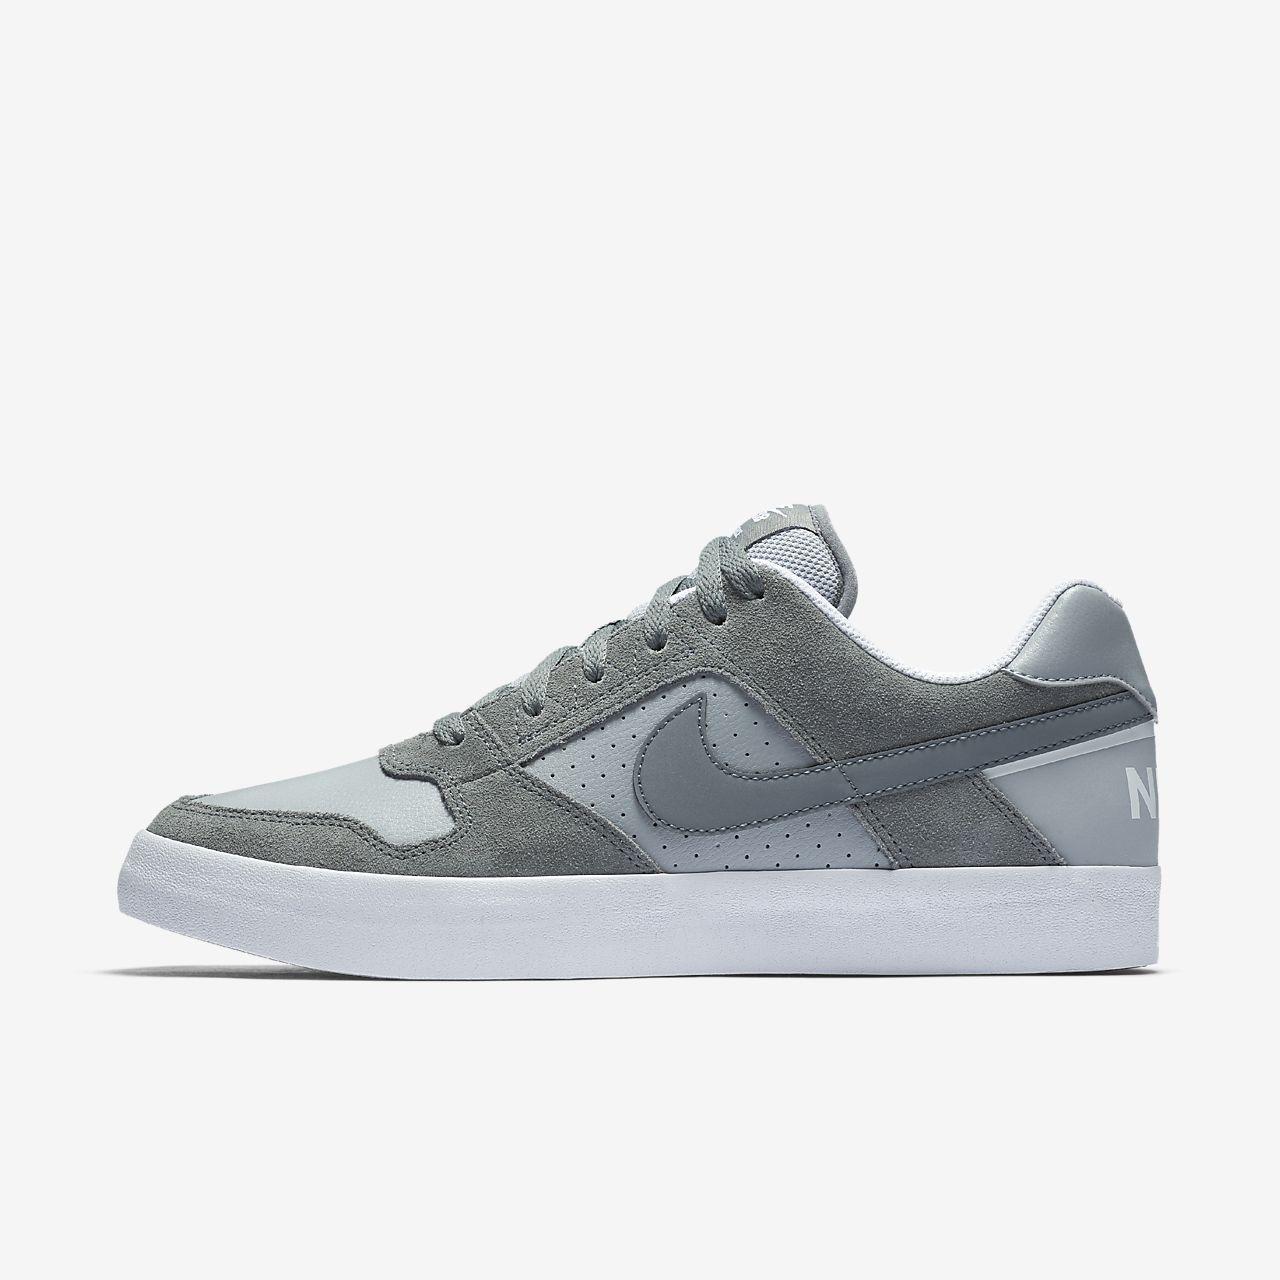 Force De Nike Chaussure Delta Homme Fr Pour Skateboard Sb Vulc cXqZgWZRdA